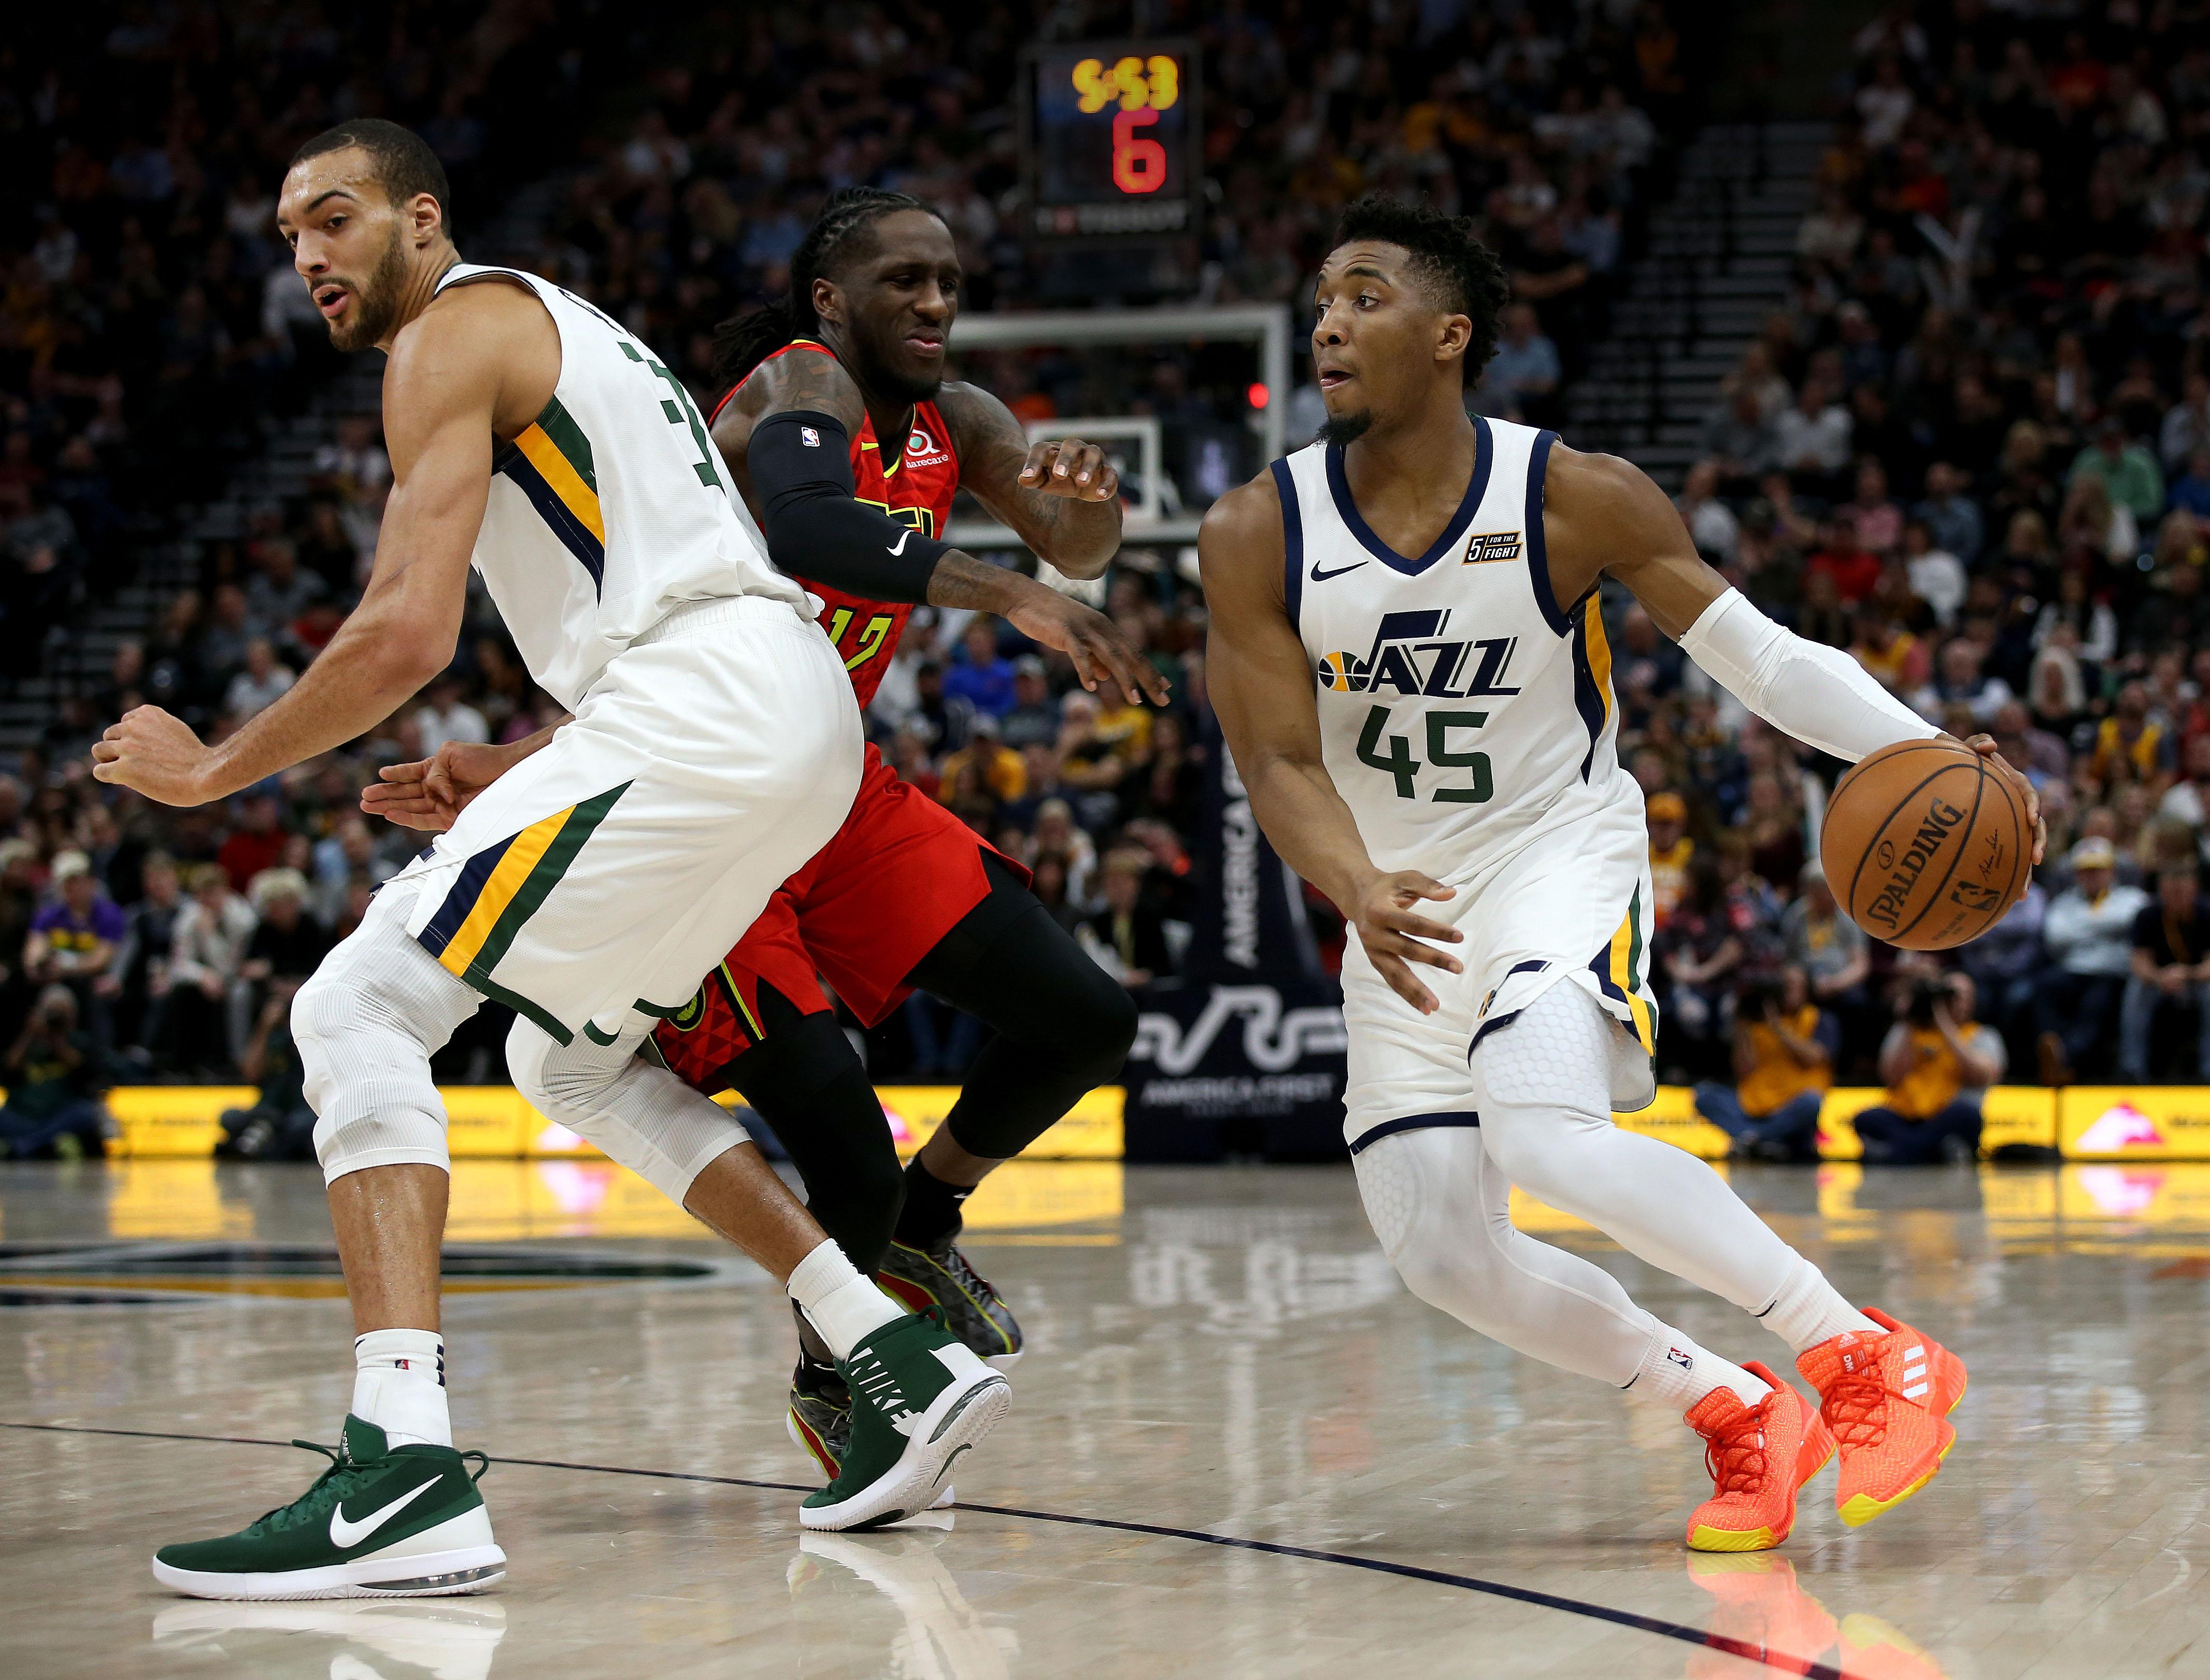 Utah Jazz center Rudy Gobert (27) blocks Atlanta Hawks forward Taurean Prince (12) for Utah Jazz Donovan Mitchell (45) at Vivint Smart Home Arena in Salt Lake City on Friday, Feb.1, 2019.